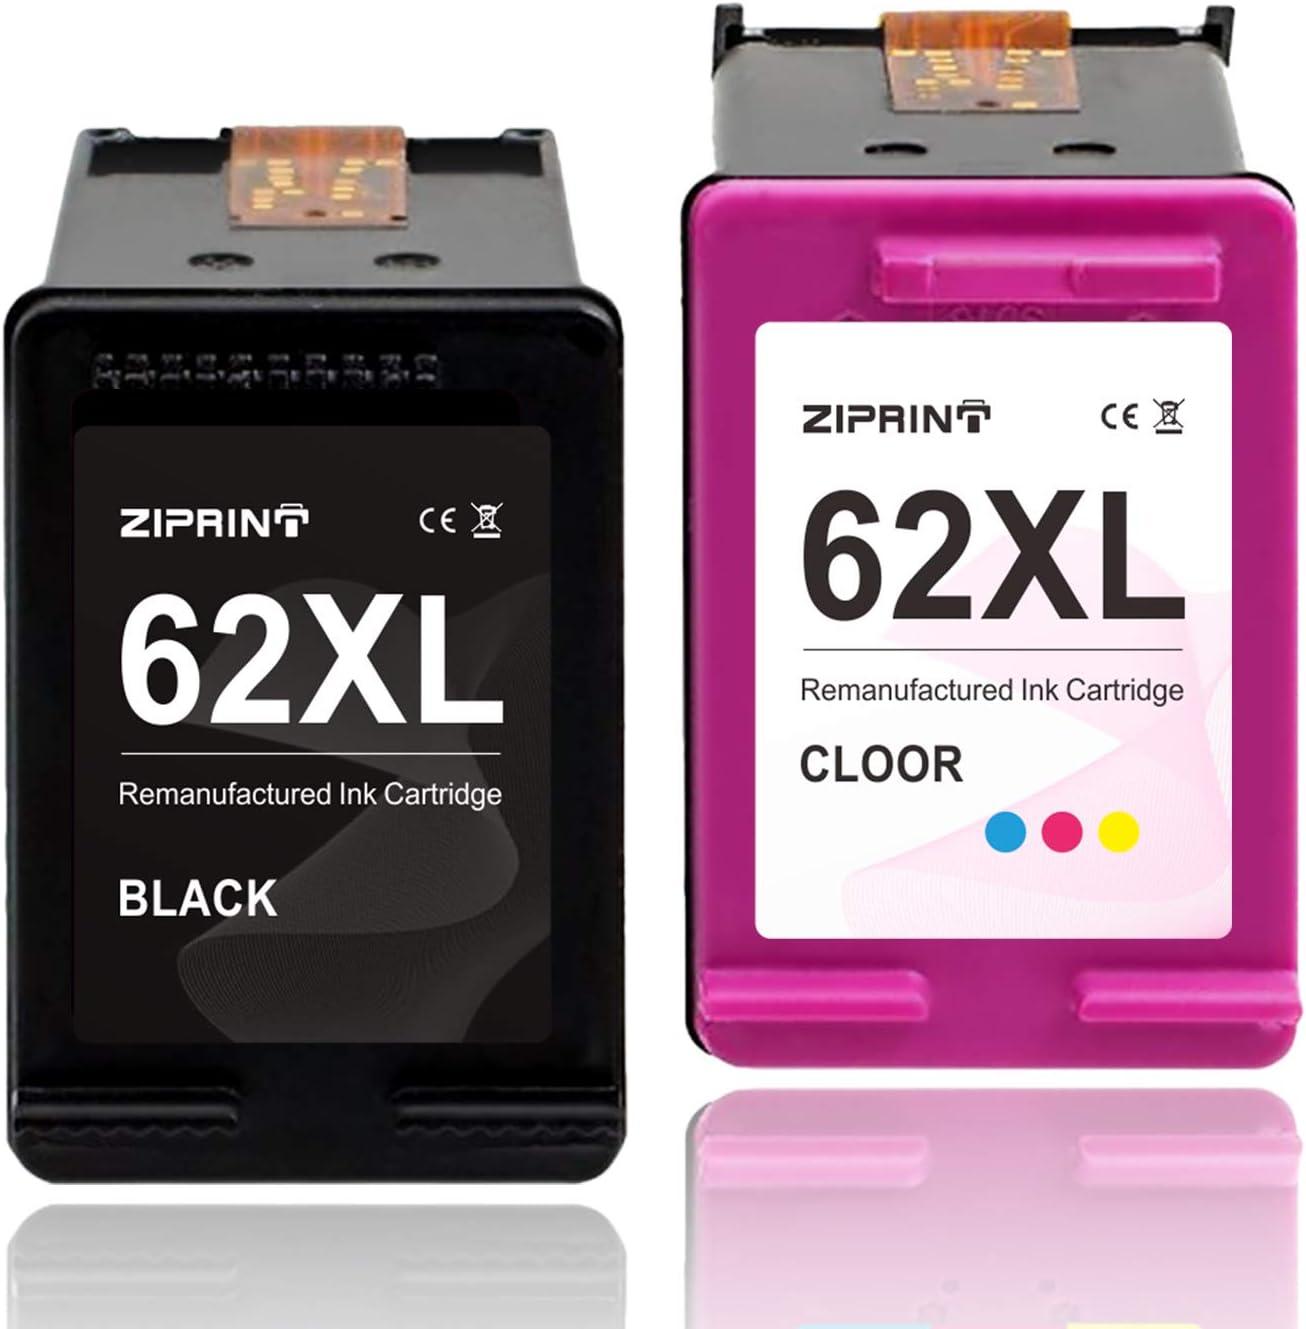 ZIPRINT Compatible HP 62XL HP 62 XL Cartucho 2 Multipack para HP OfficeJet 5740 5742 5744 5745 5746 eAIO Envy 7640 7645 8000 8005 5640 5642 5643 5644 5646 5660 5665 eAIO Impresora: Amazon.es: Electrónica